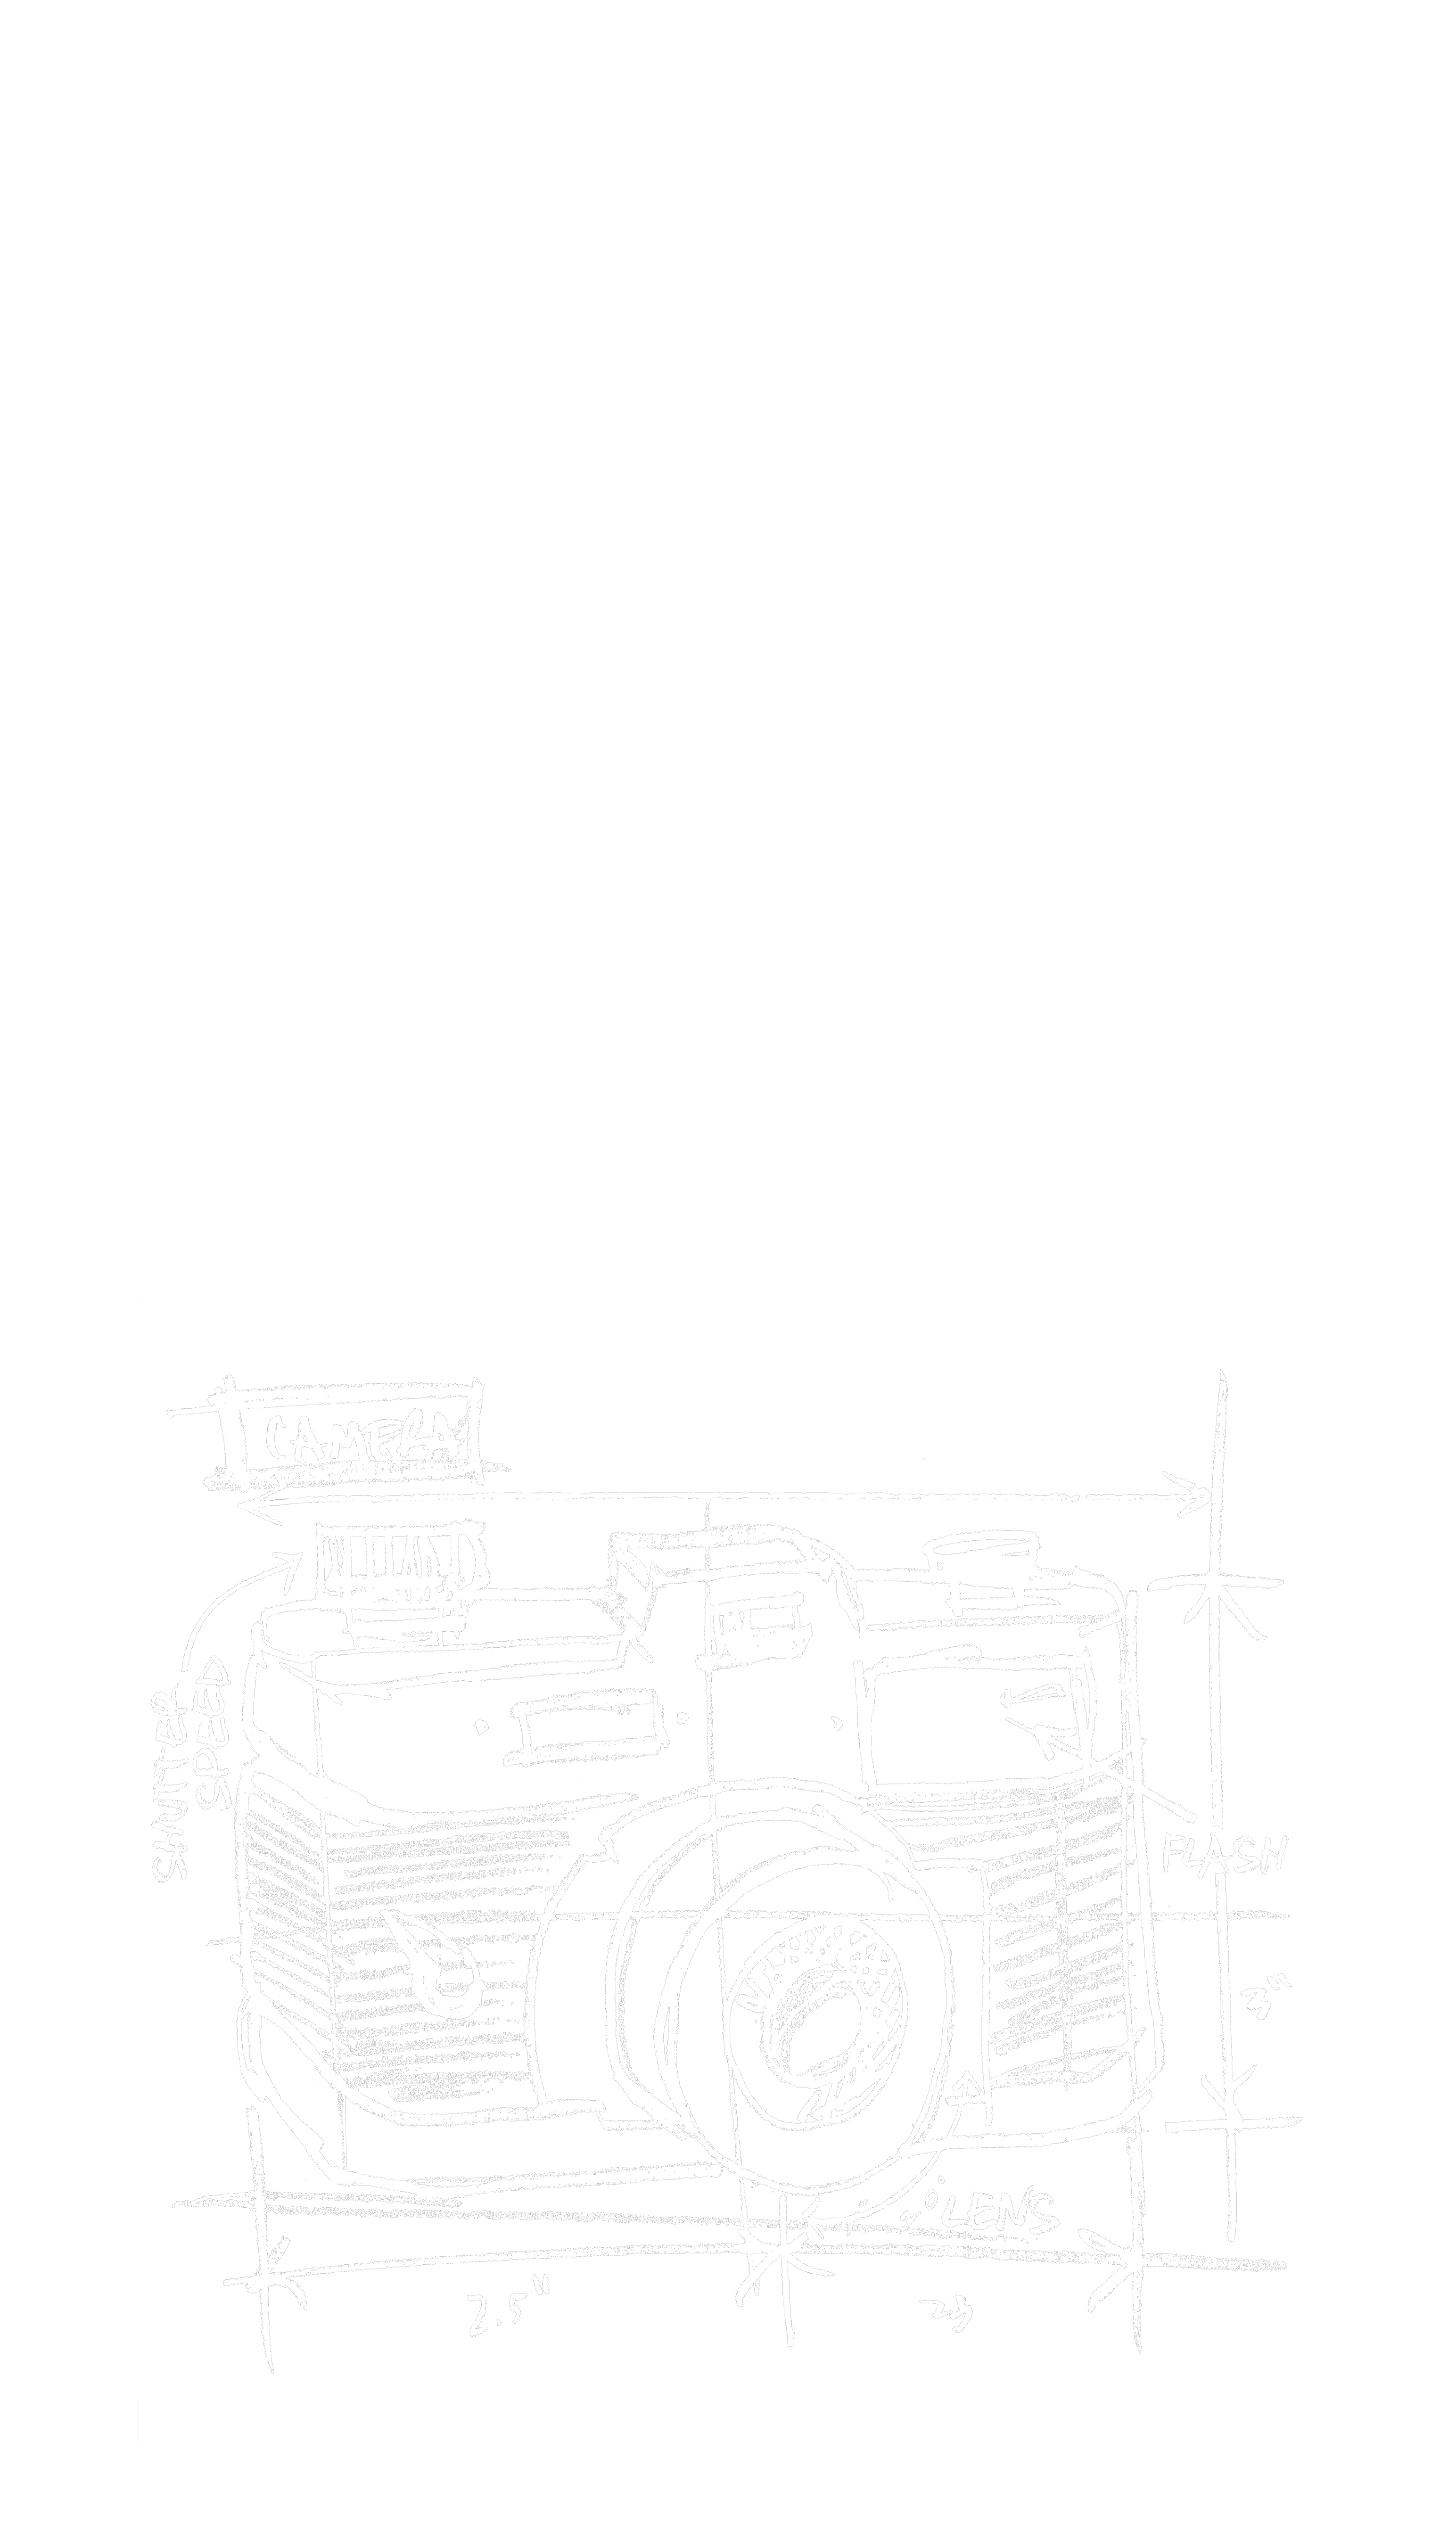 jason mordoh photographics